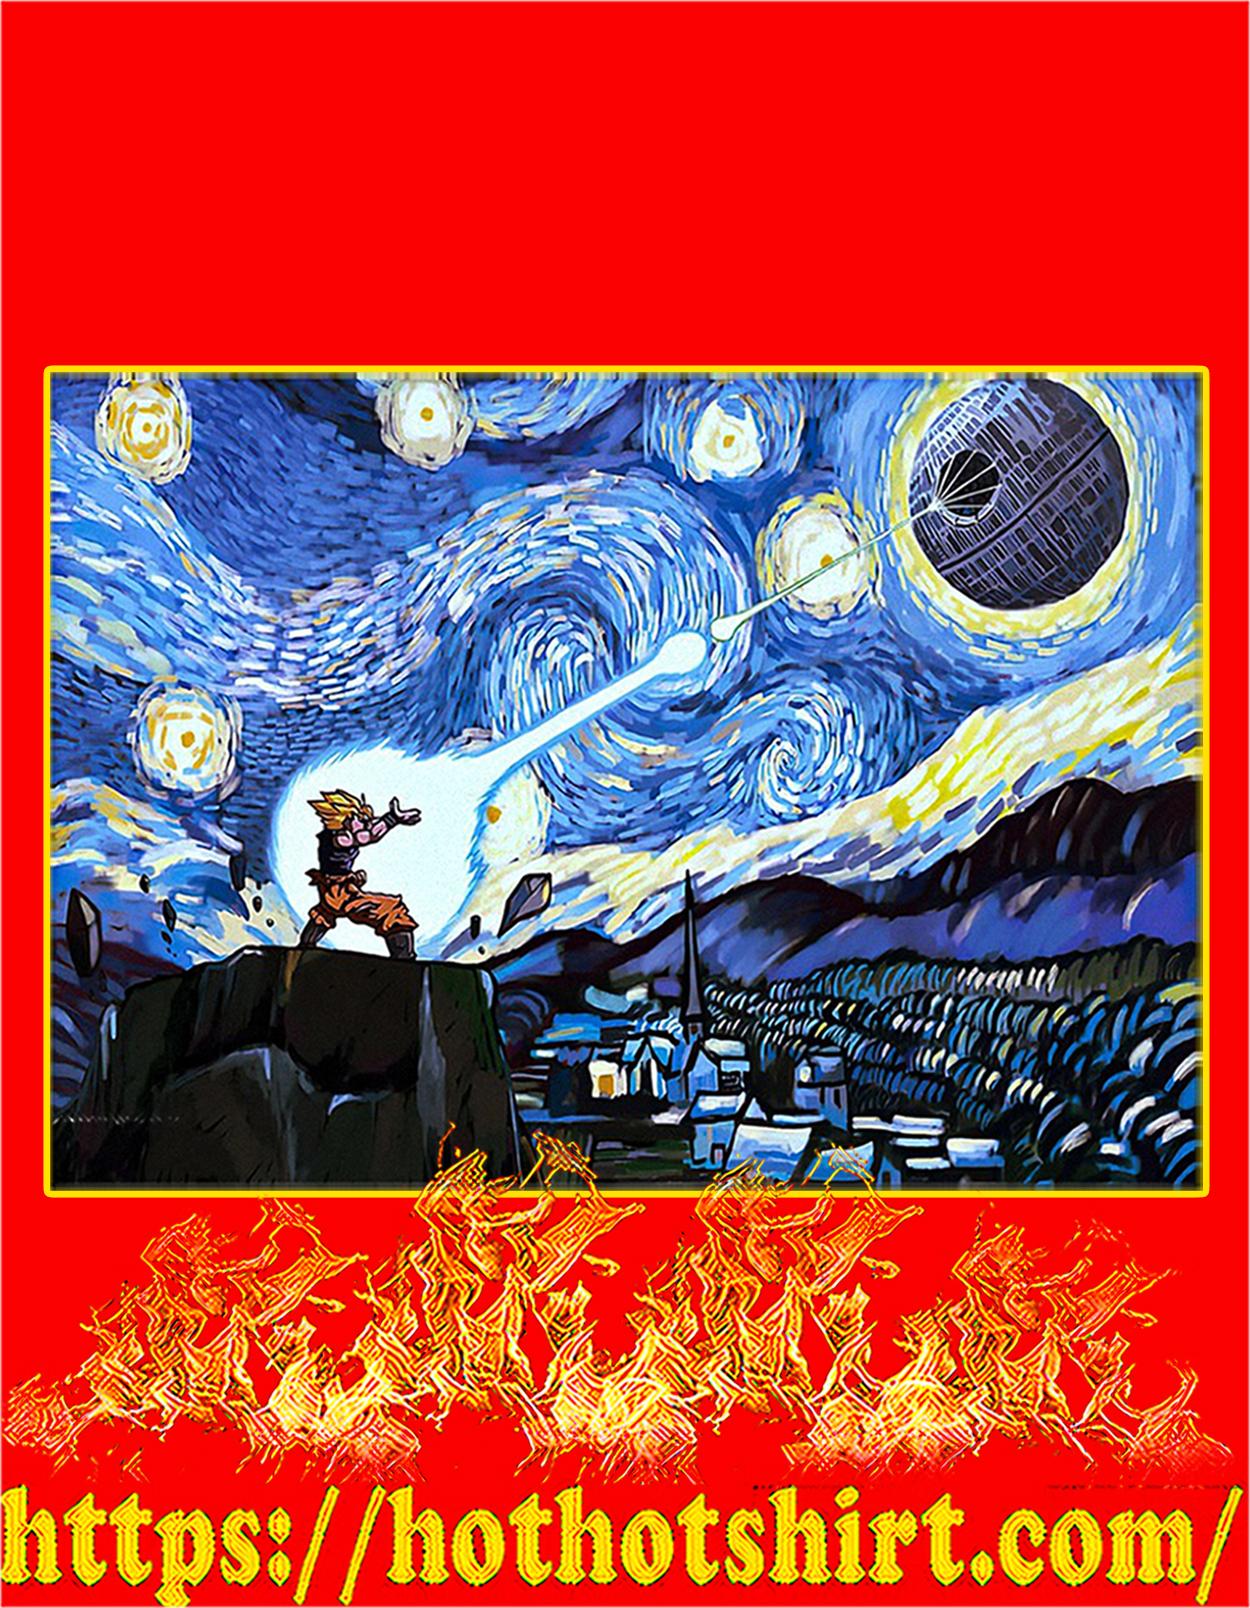 Goku vs Death Star starry night van gogh poster - A3